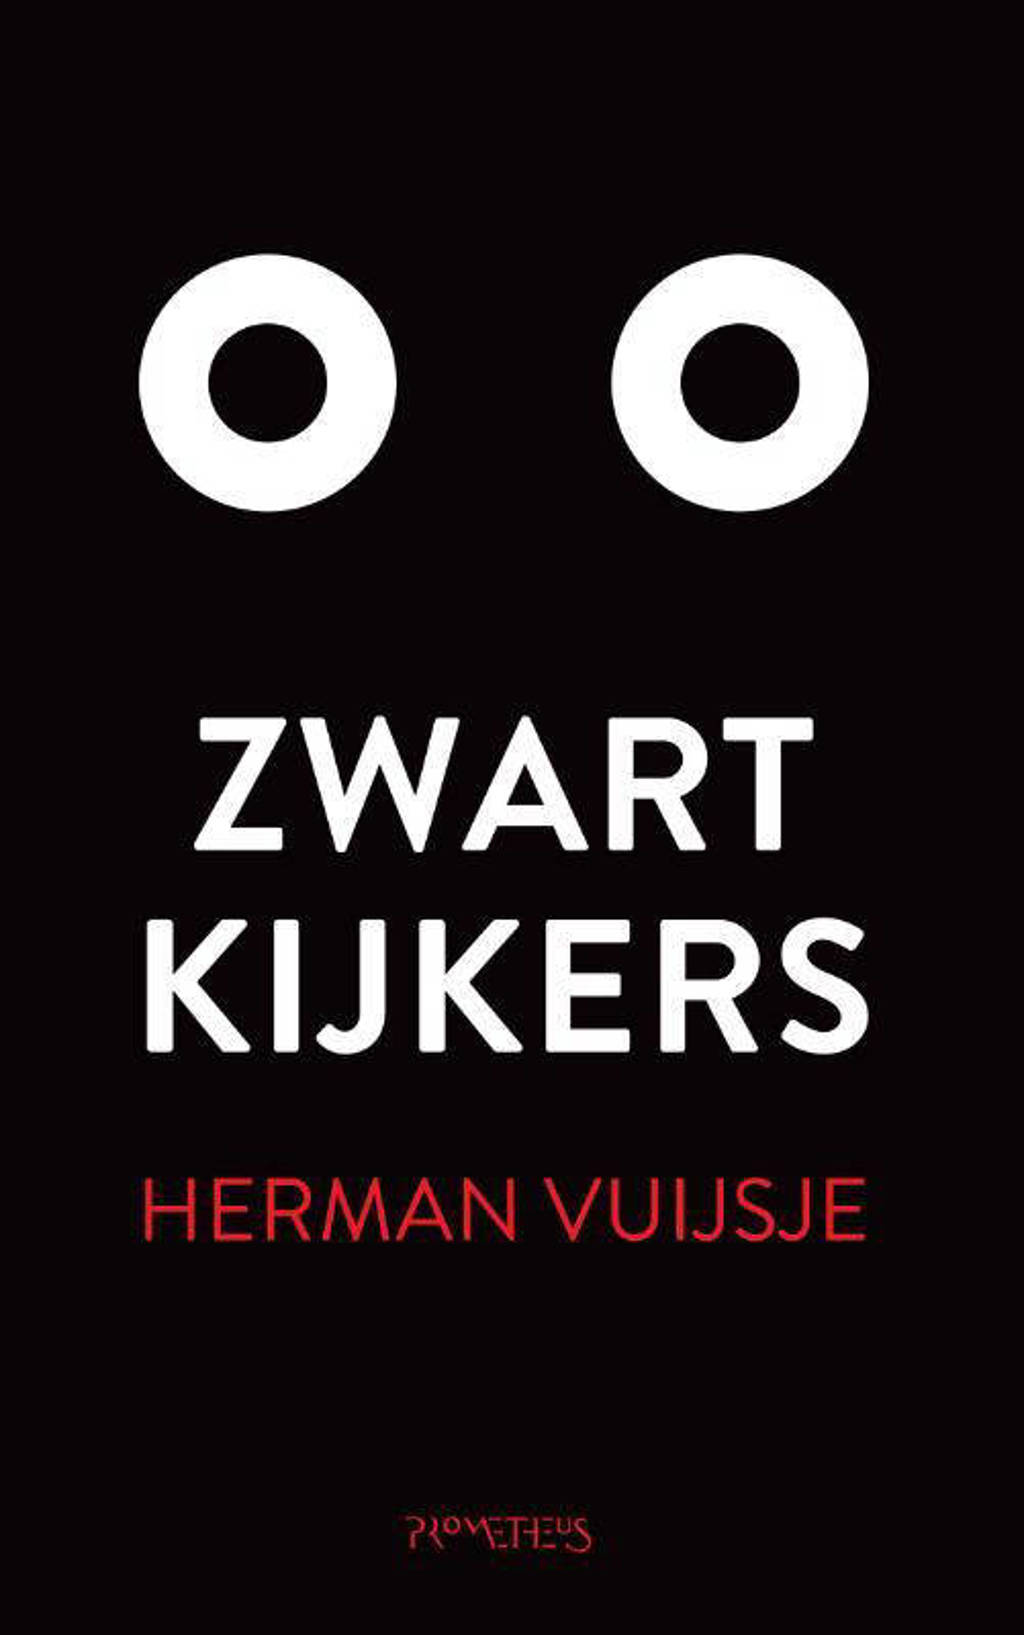 Zwartkijkers - Herman Vuijsje